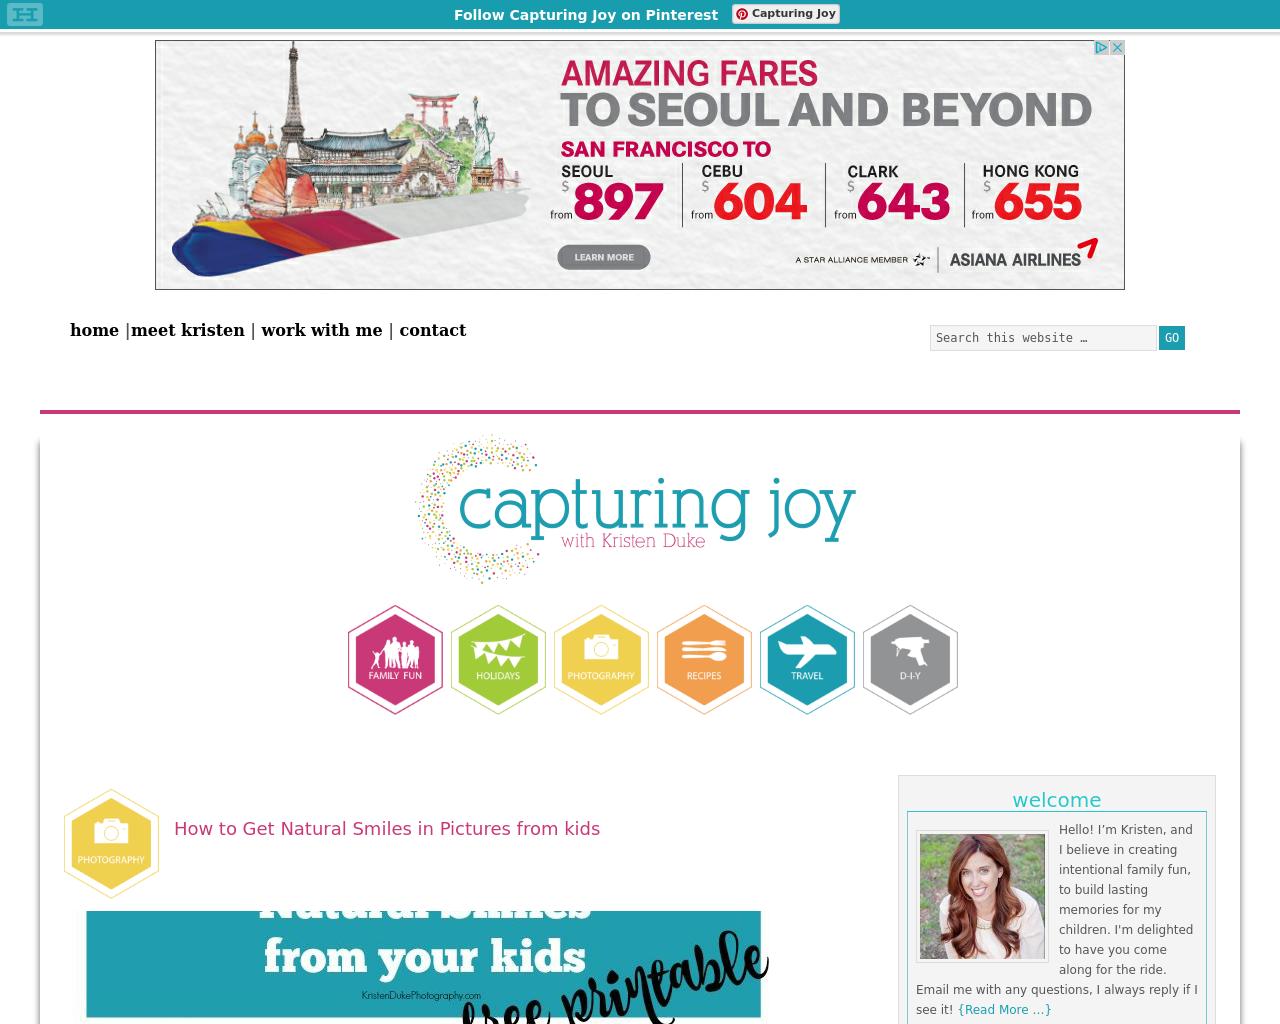 Capturing-Joy-with-Kristen-Duke-Advertising-Reviews-Pricing